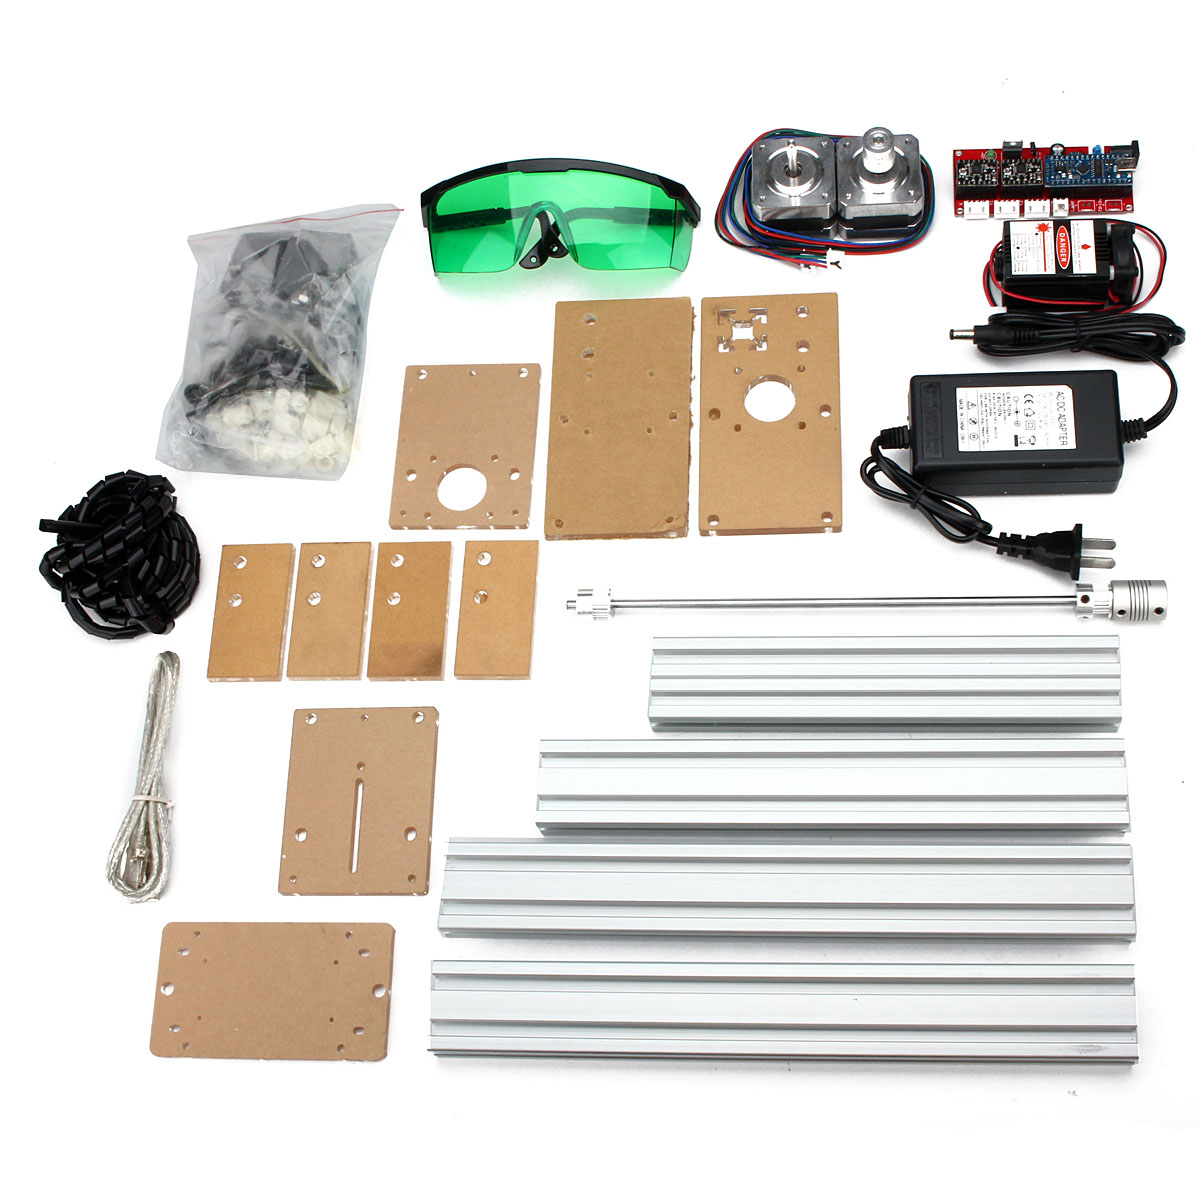 20X17cm Mini DIY Desktop 500mW Blue Laser Engraving Engraver Machine CNC Wood Router/Printer/Cutter/ Adjust + Laser Goggles